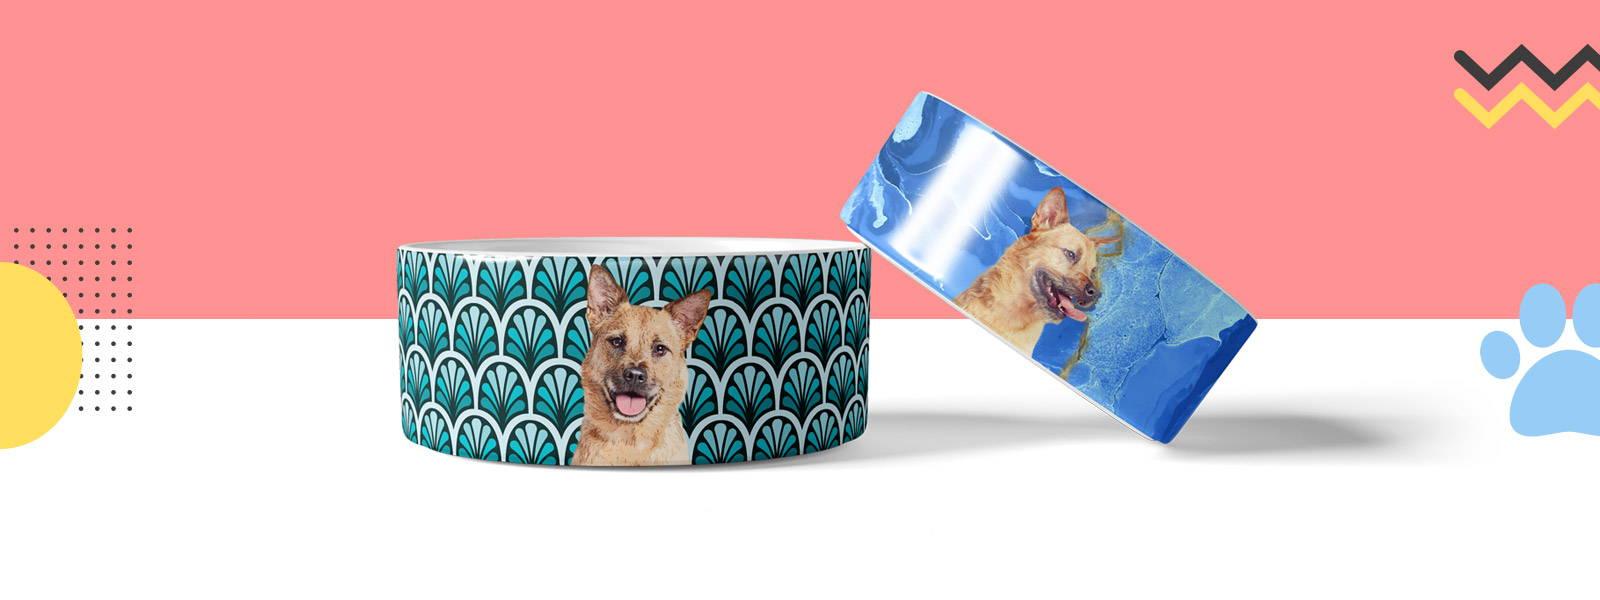 Custom pet portraits printed on pet bowls